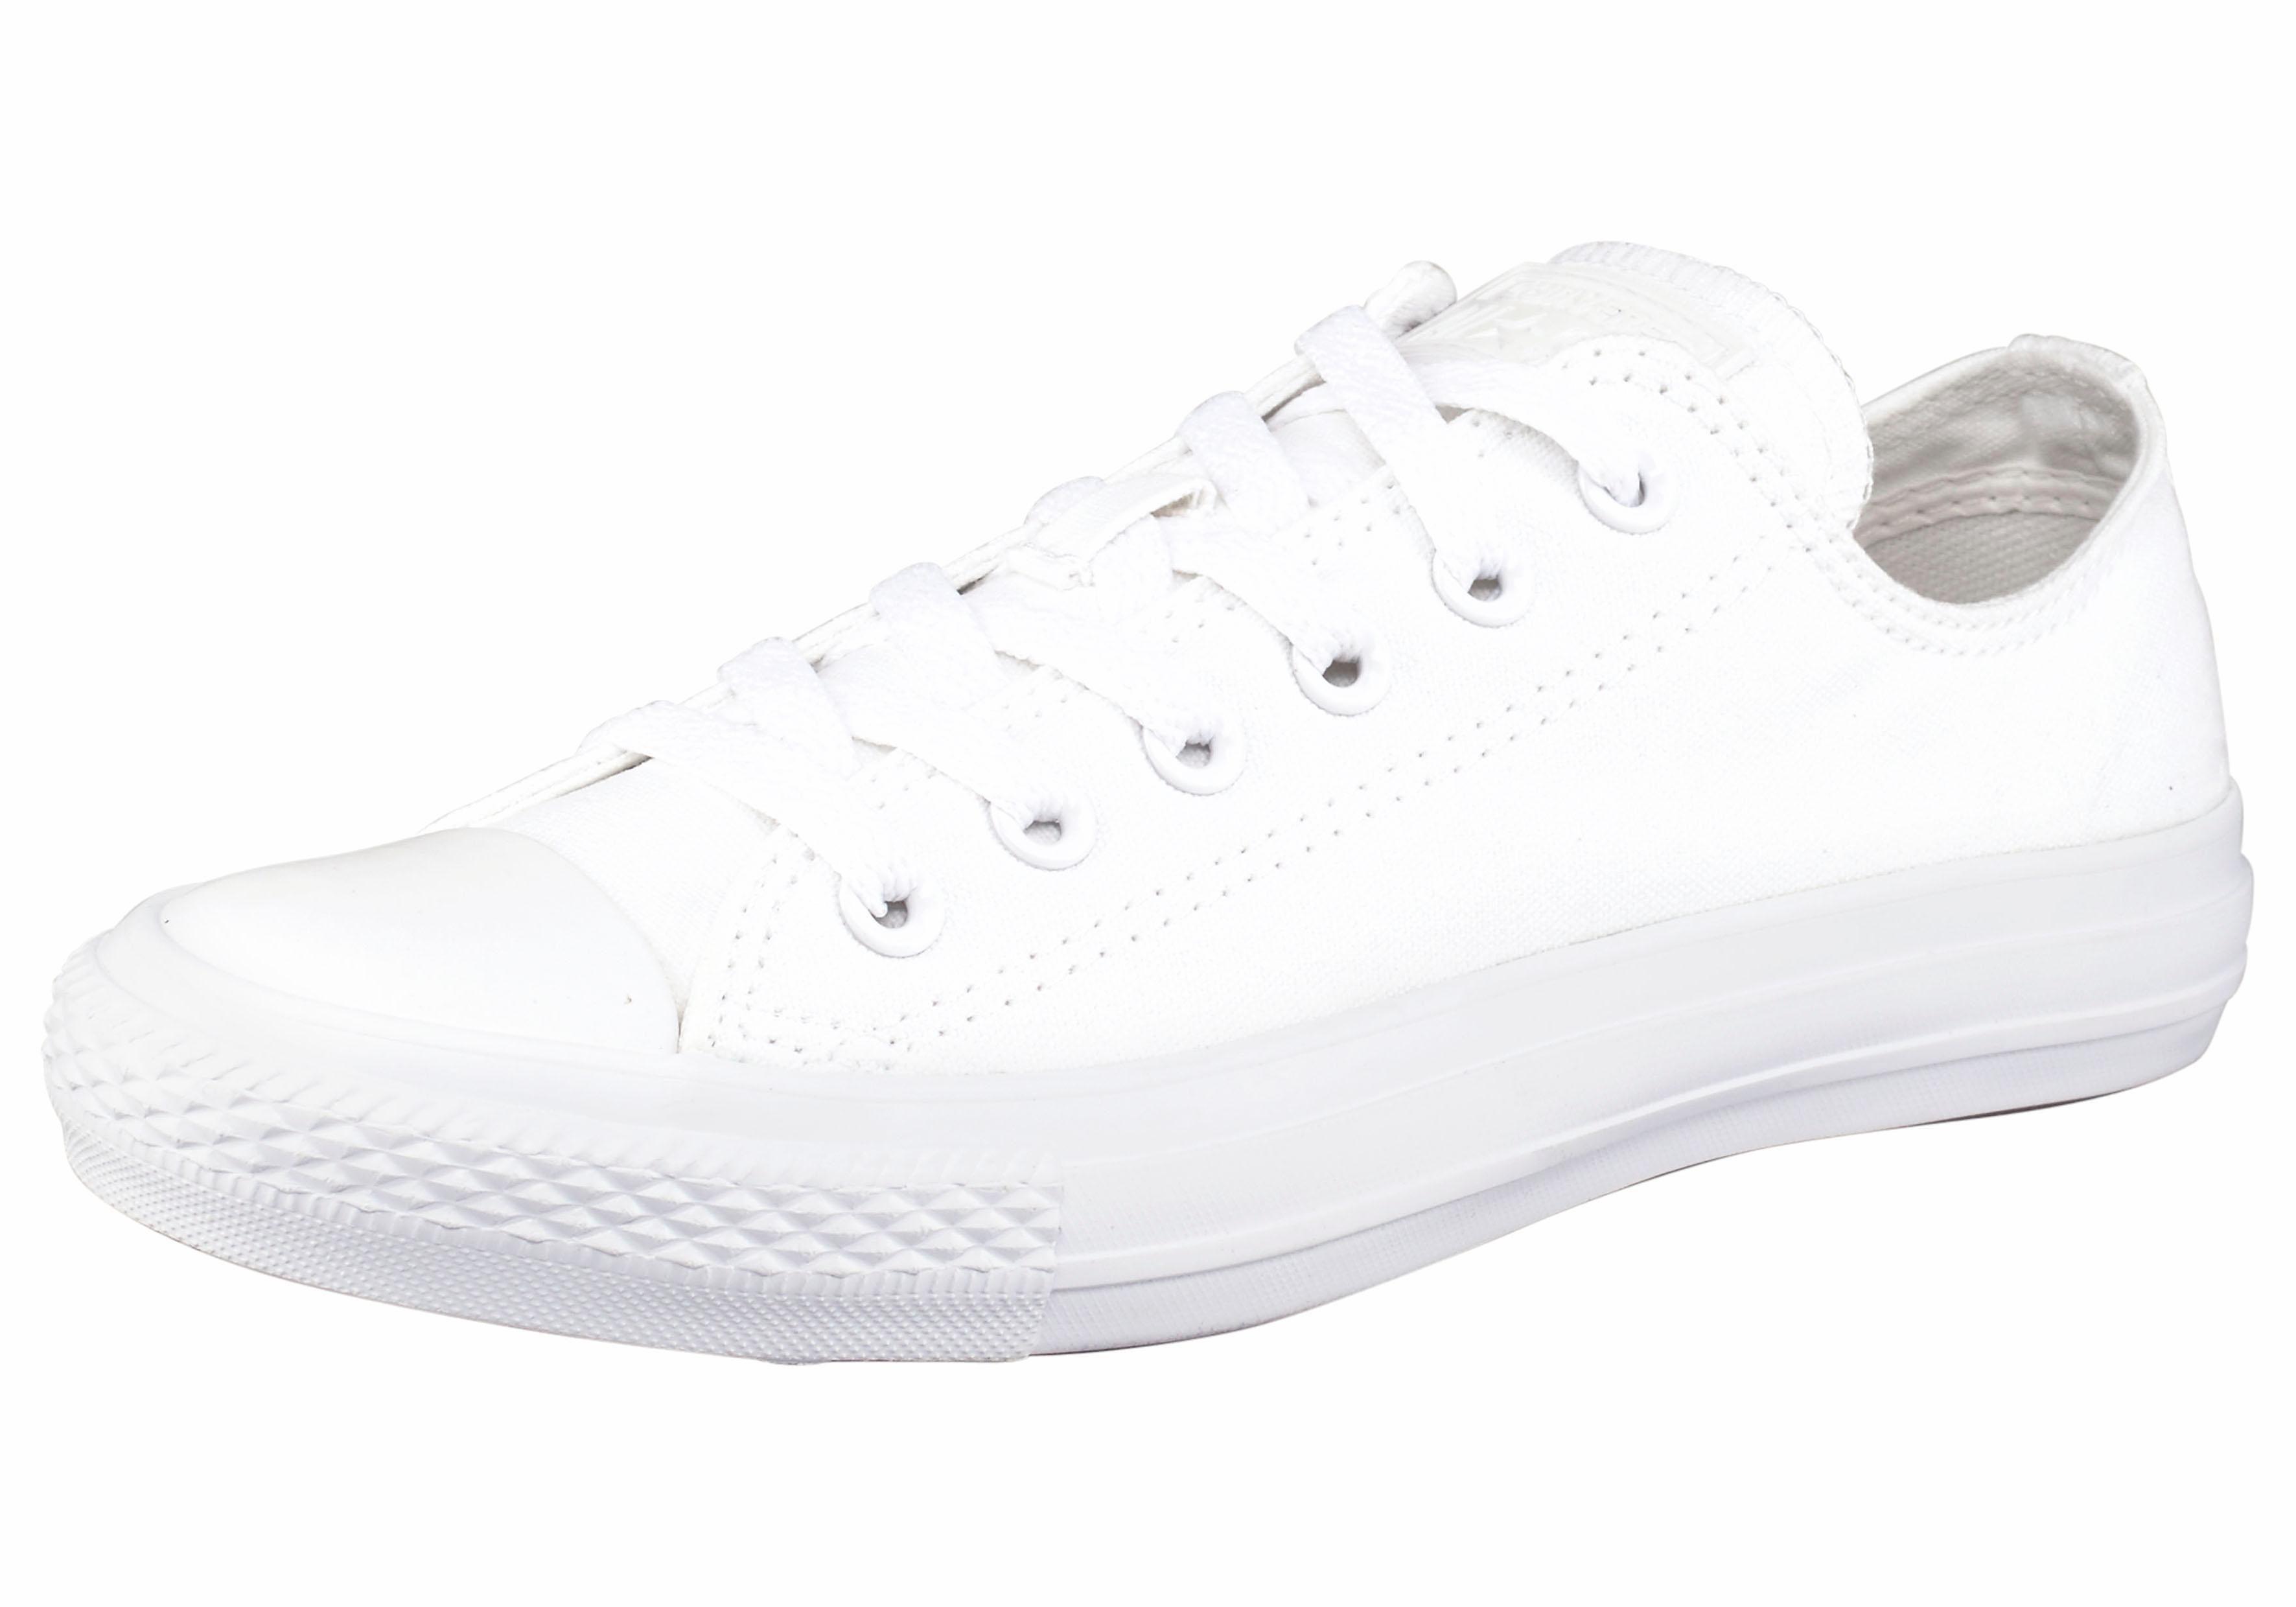 Converse Chuck Taylor All Star Seasonal Ox Monocrome Sneaker online kaufen  weiß